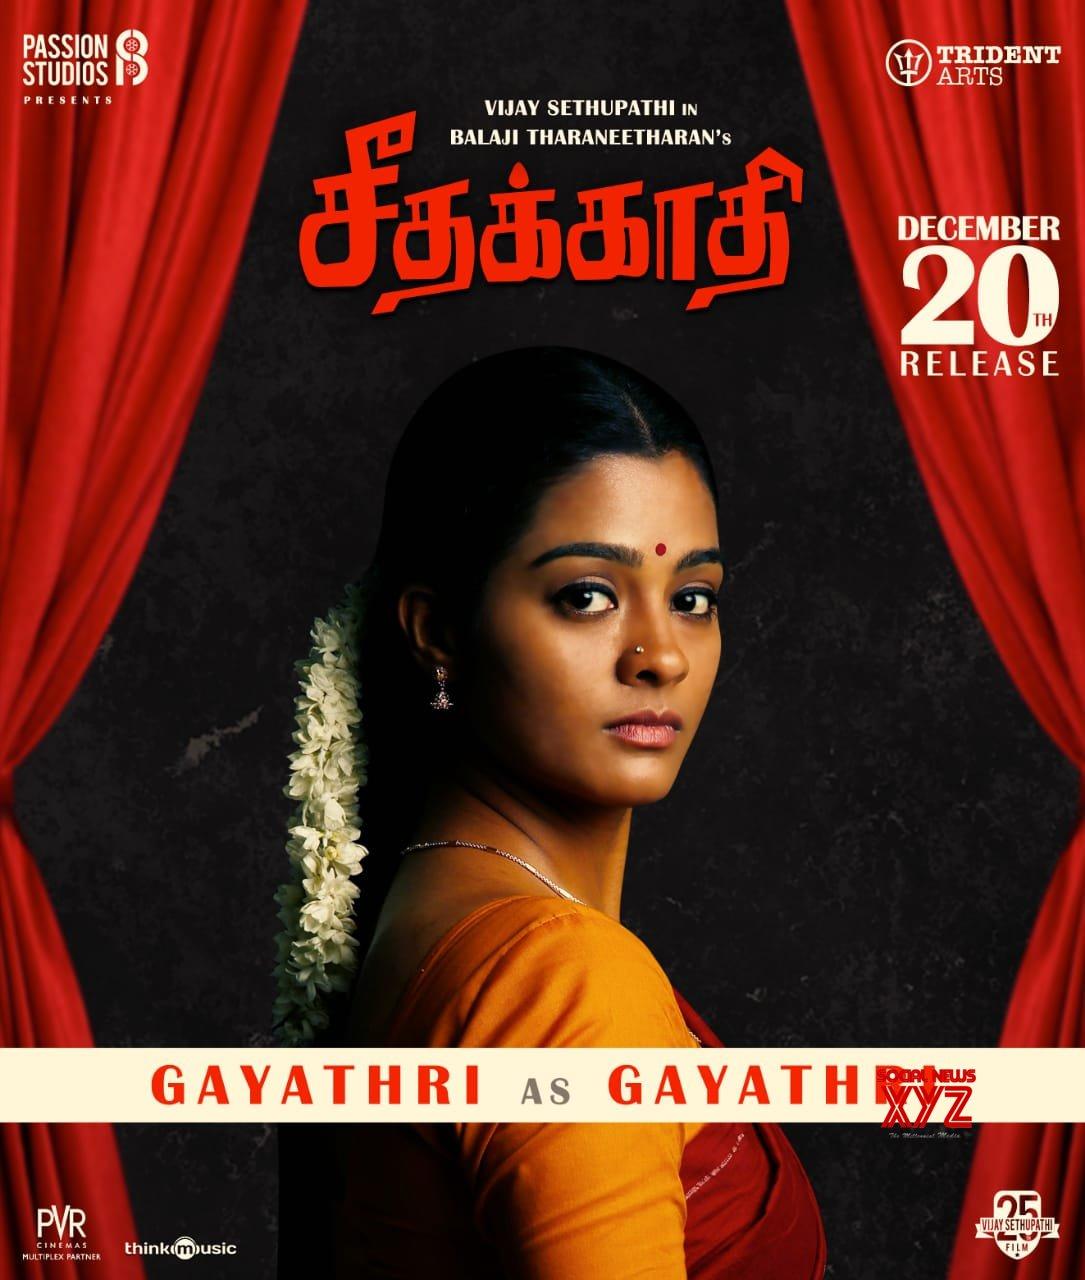 Gayathri As Gayathri From Seethakaathi